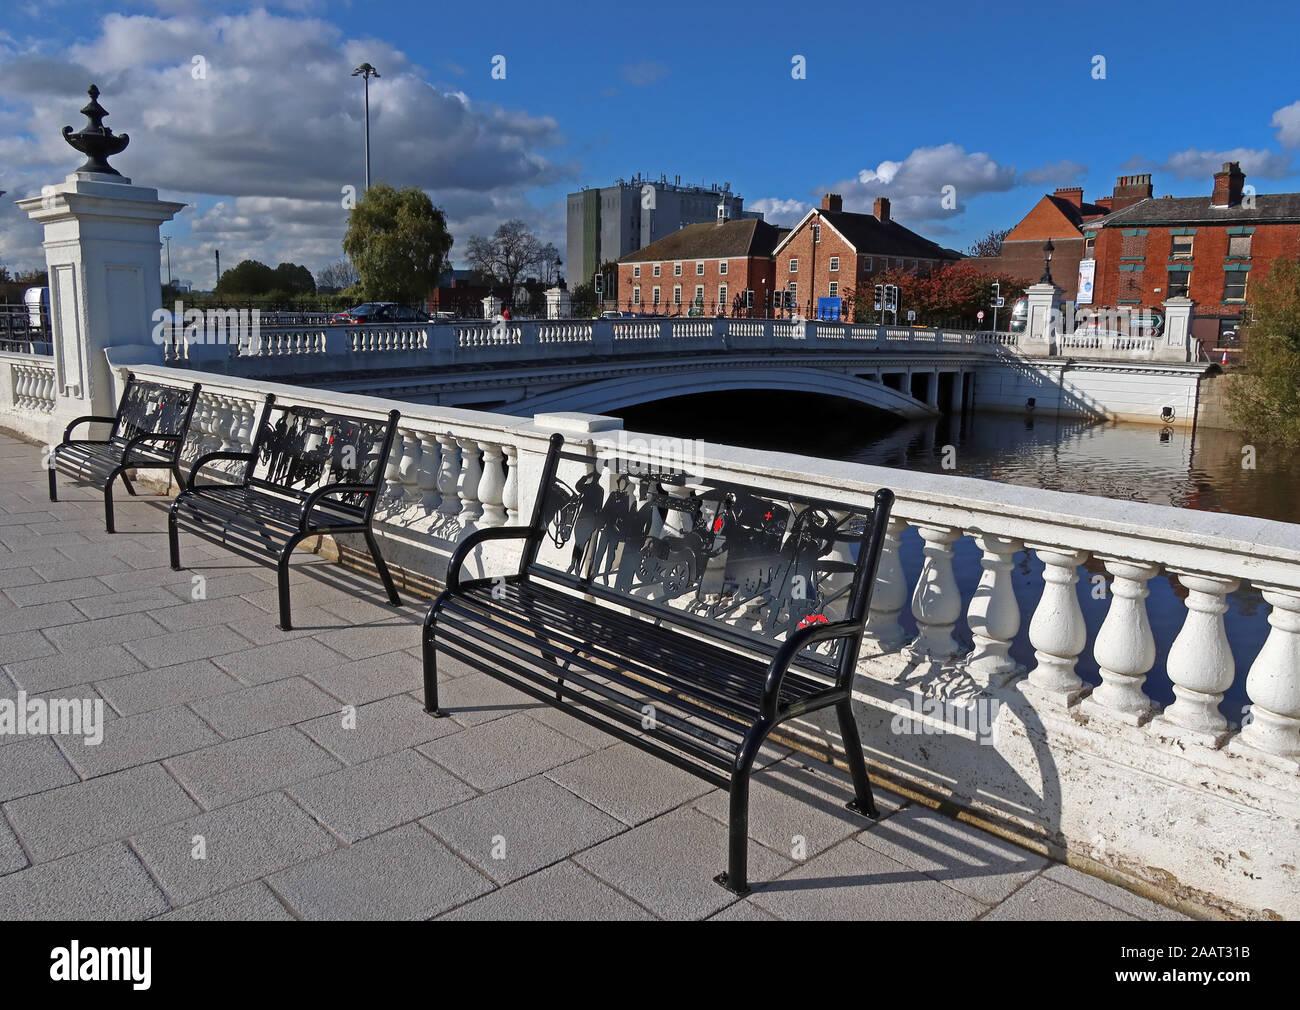 HotpixUk,@HotpixUK,GoTonySmith,UK,England,English,Mersey,at,bridges,crossing,flood,flooding,October 2019,autumn,full moon,lunar,tides,tide,Environmental Agency,flood defenses,River Mersey Crossing,Cheshire,WA1 1WA,WA1,North West,Bridge Foot,Warrington Bridge,bench,benches,walkway,balcony